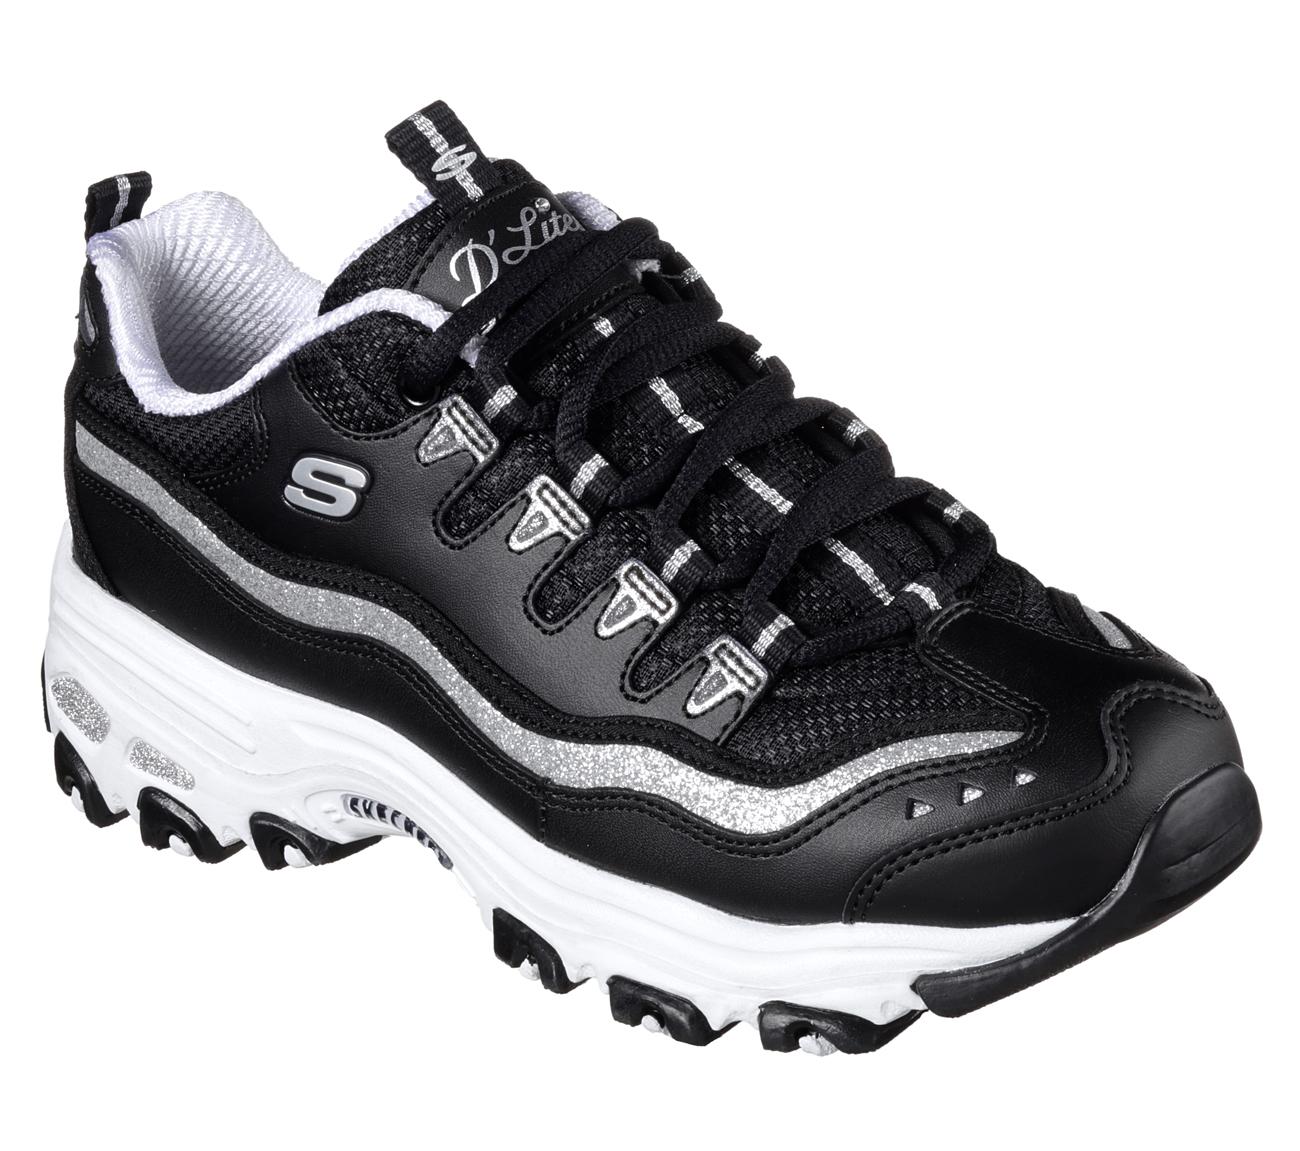 buy skechers d 39 lites now and then d 39 lites shoes only. Black Bedroom Furniture Sets. Home Design Ideas